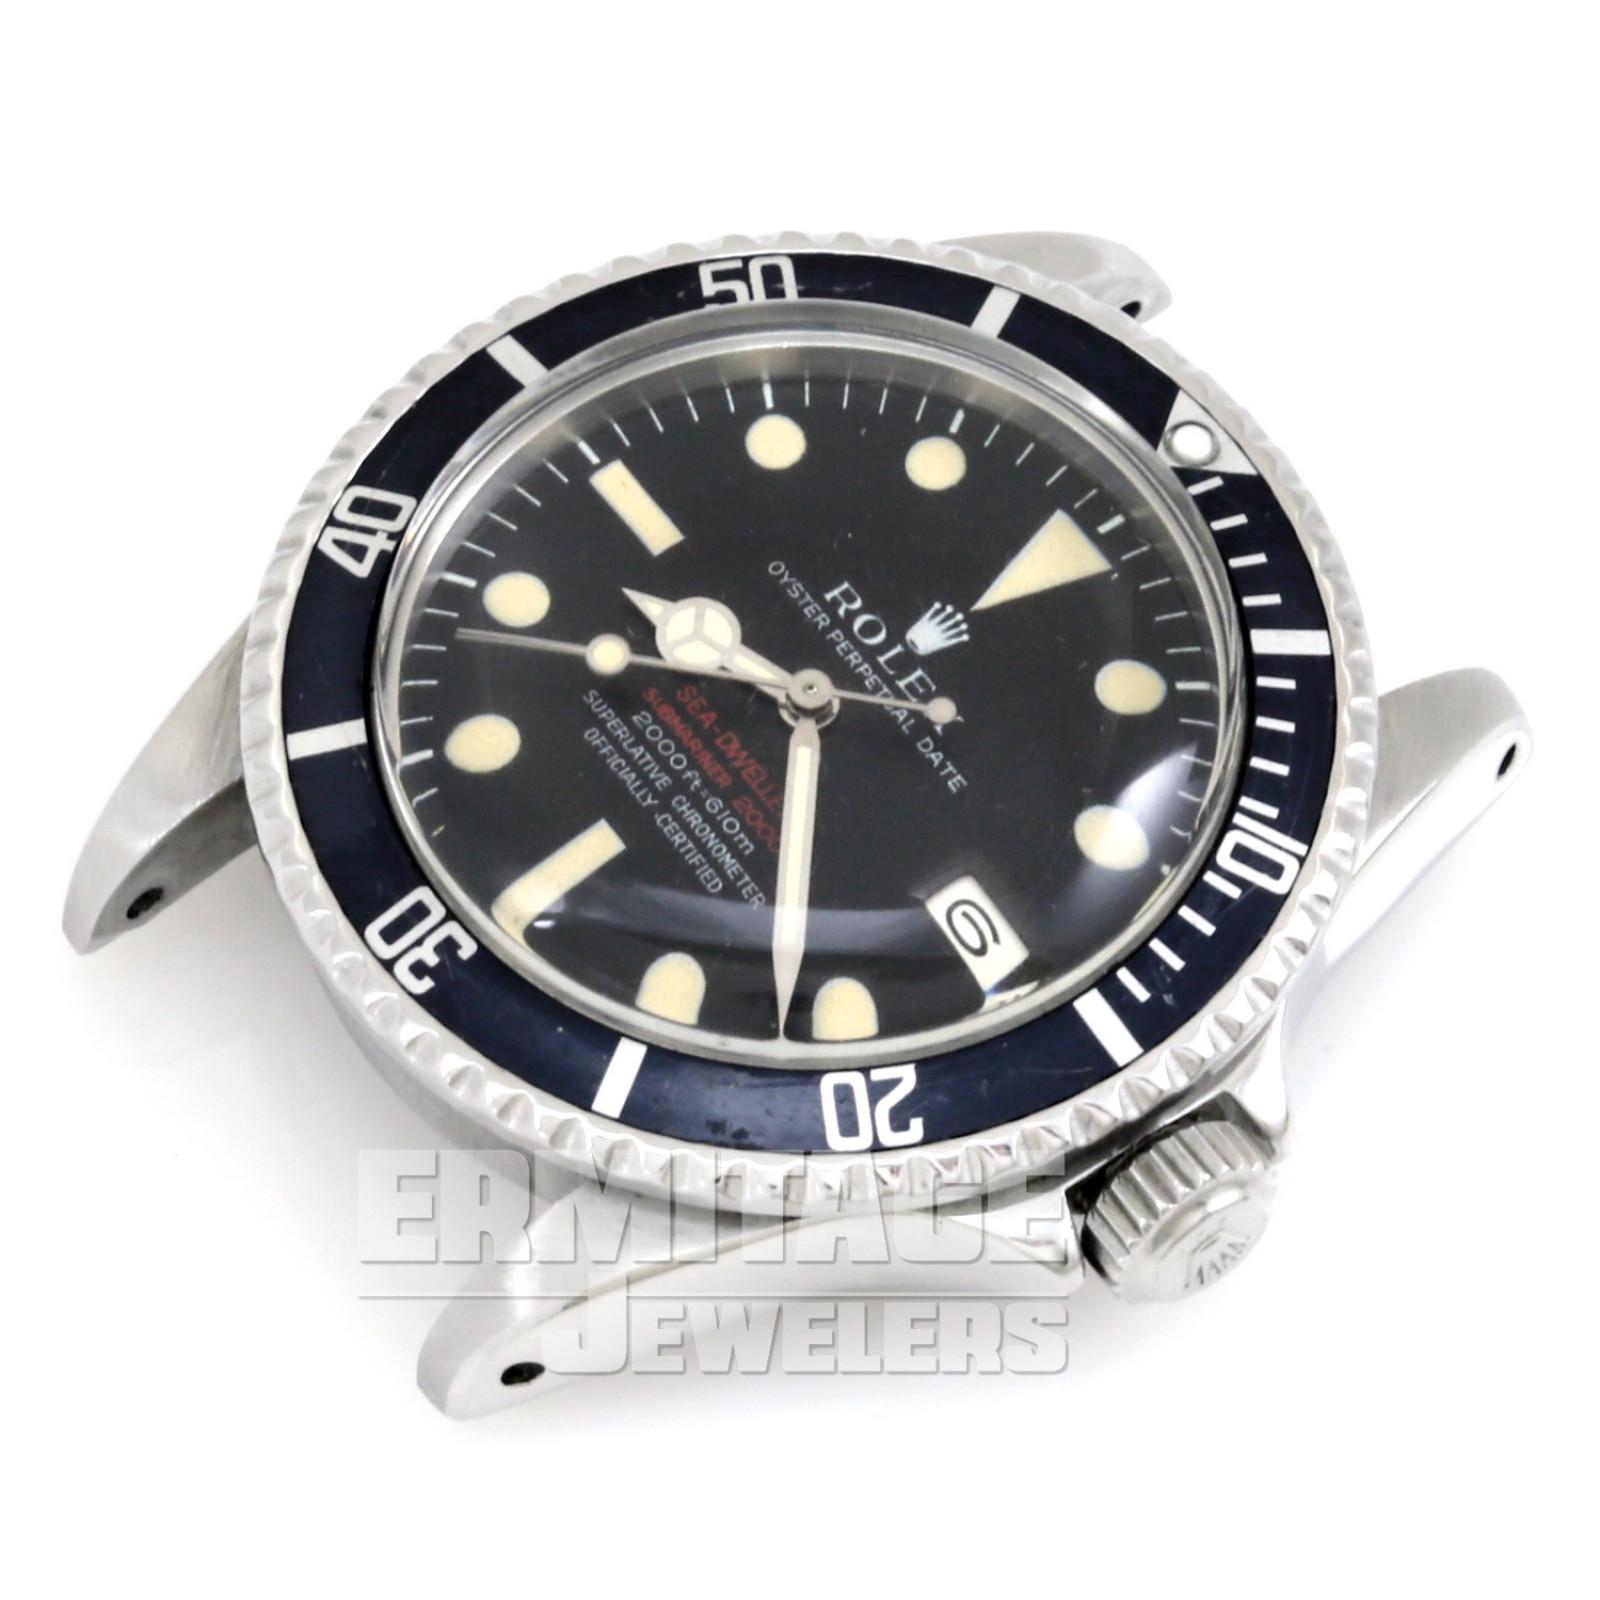 Rolex Sea-Dweller Mark II 1665